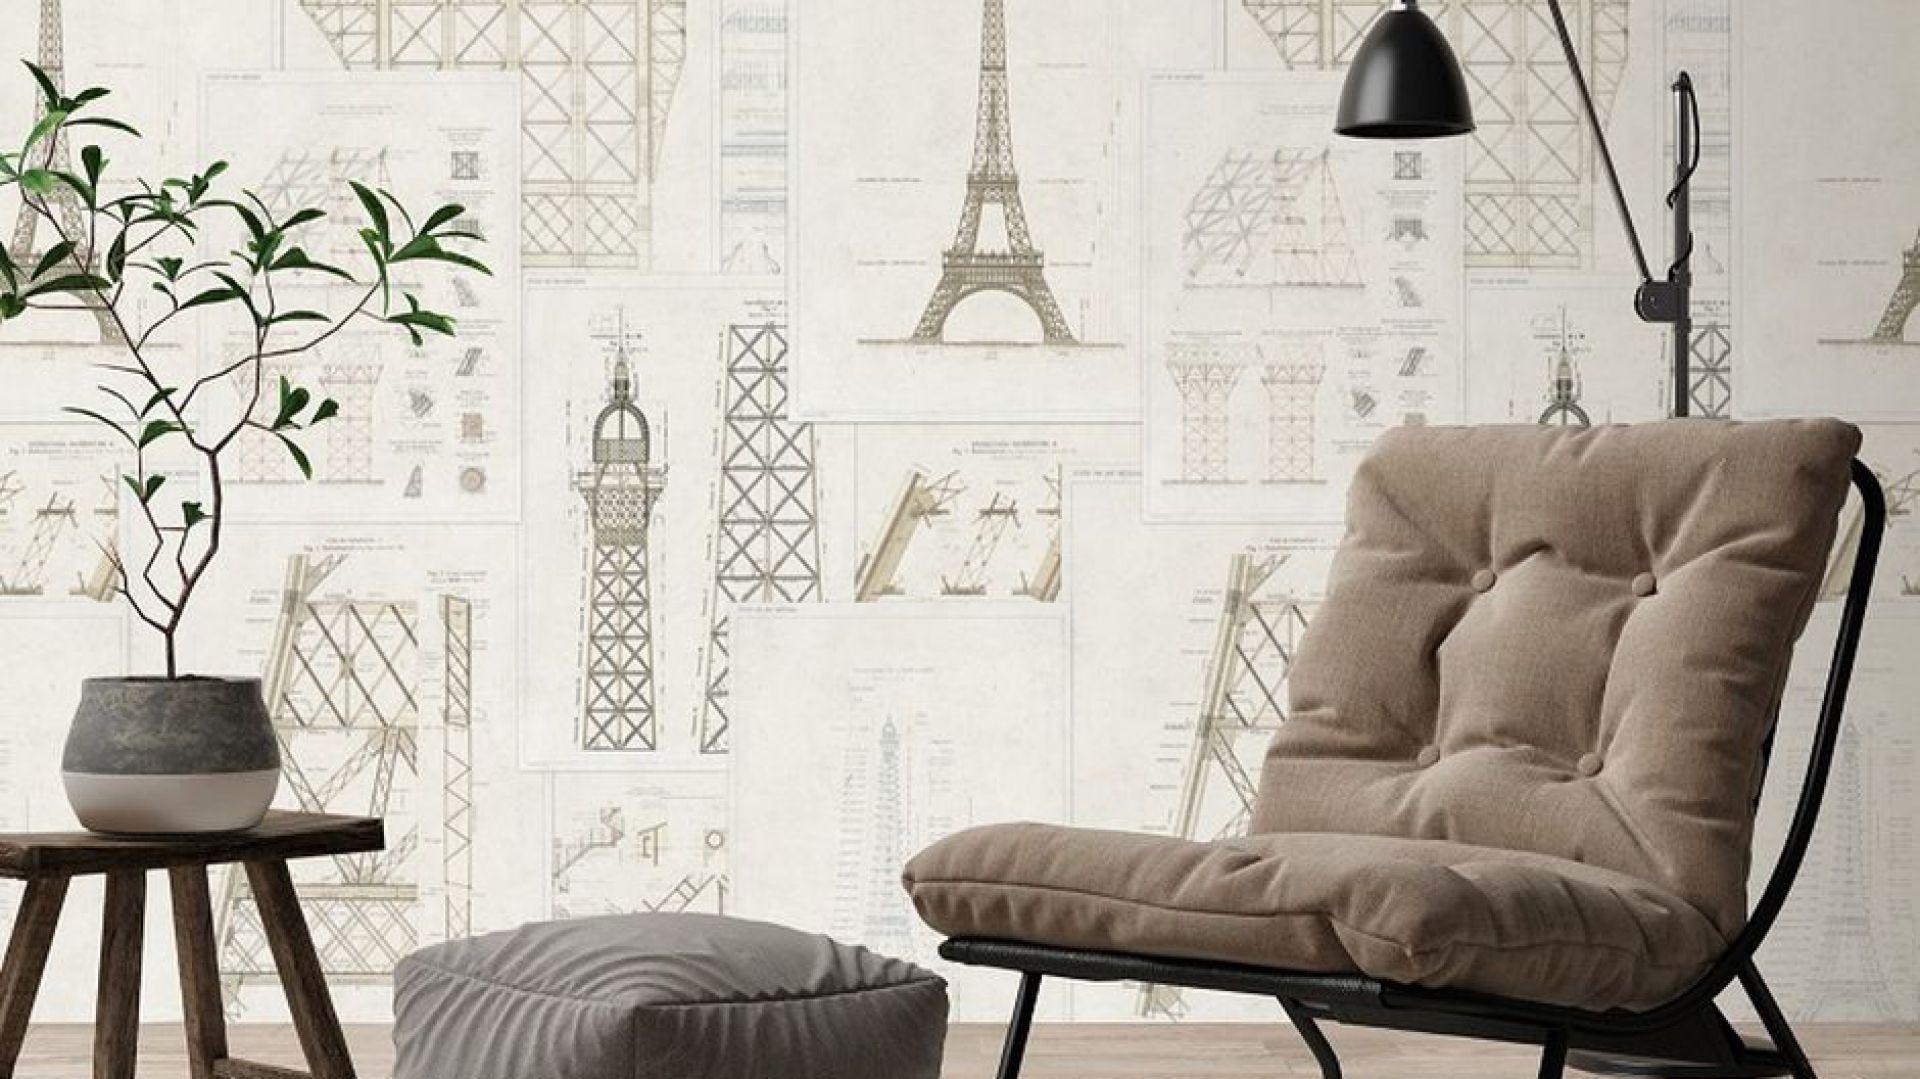 Tapety z kolekcji Histoire de L'Architecture. Fot. MindTheGap / Dekorian Home